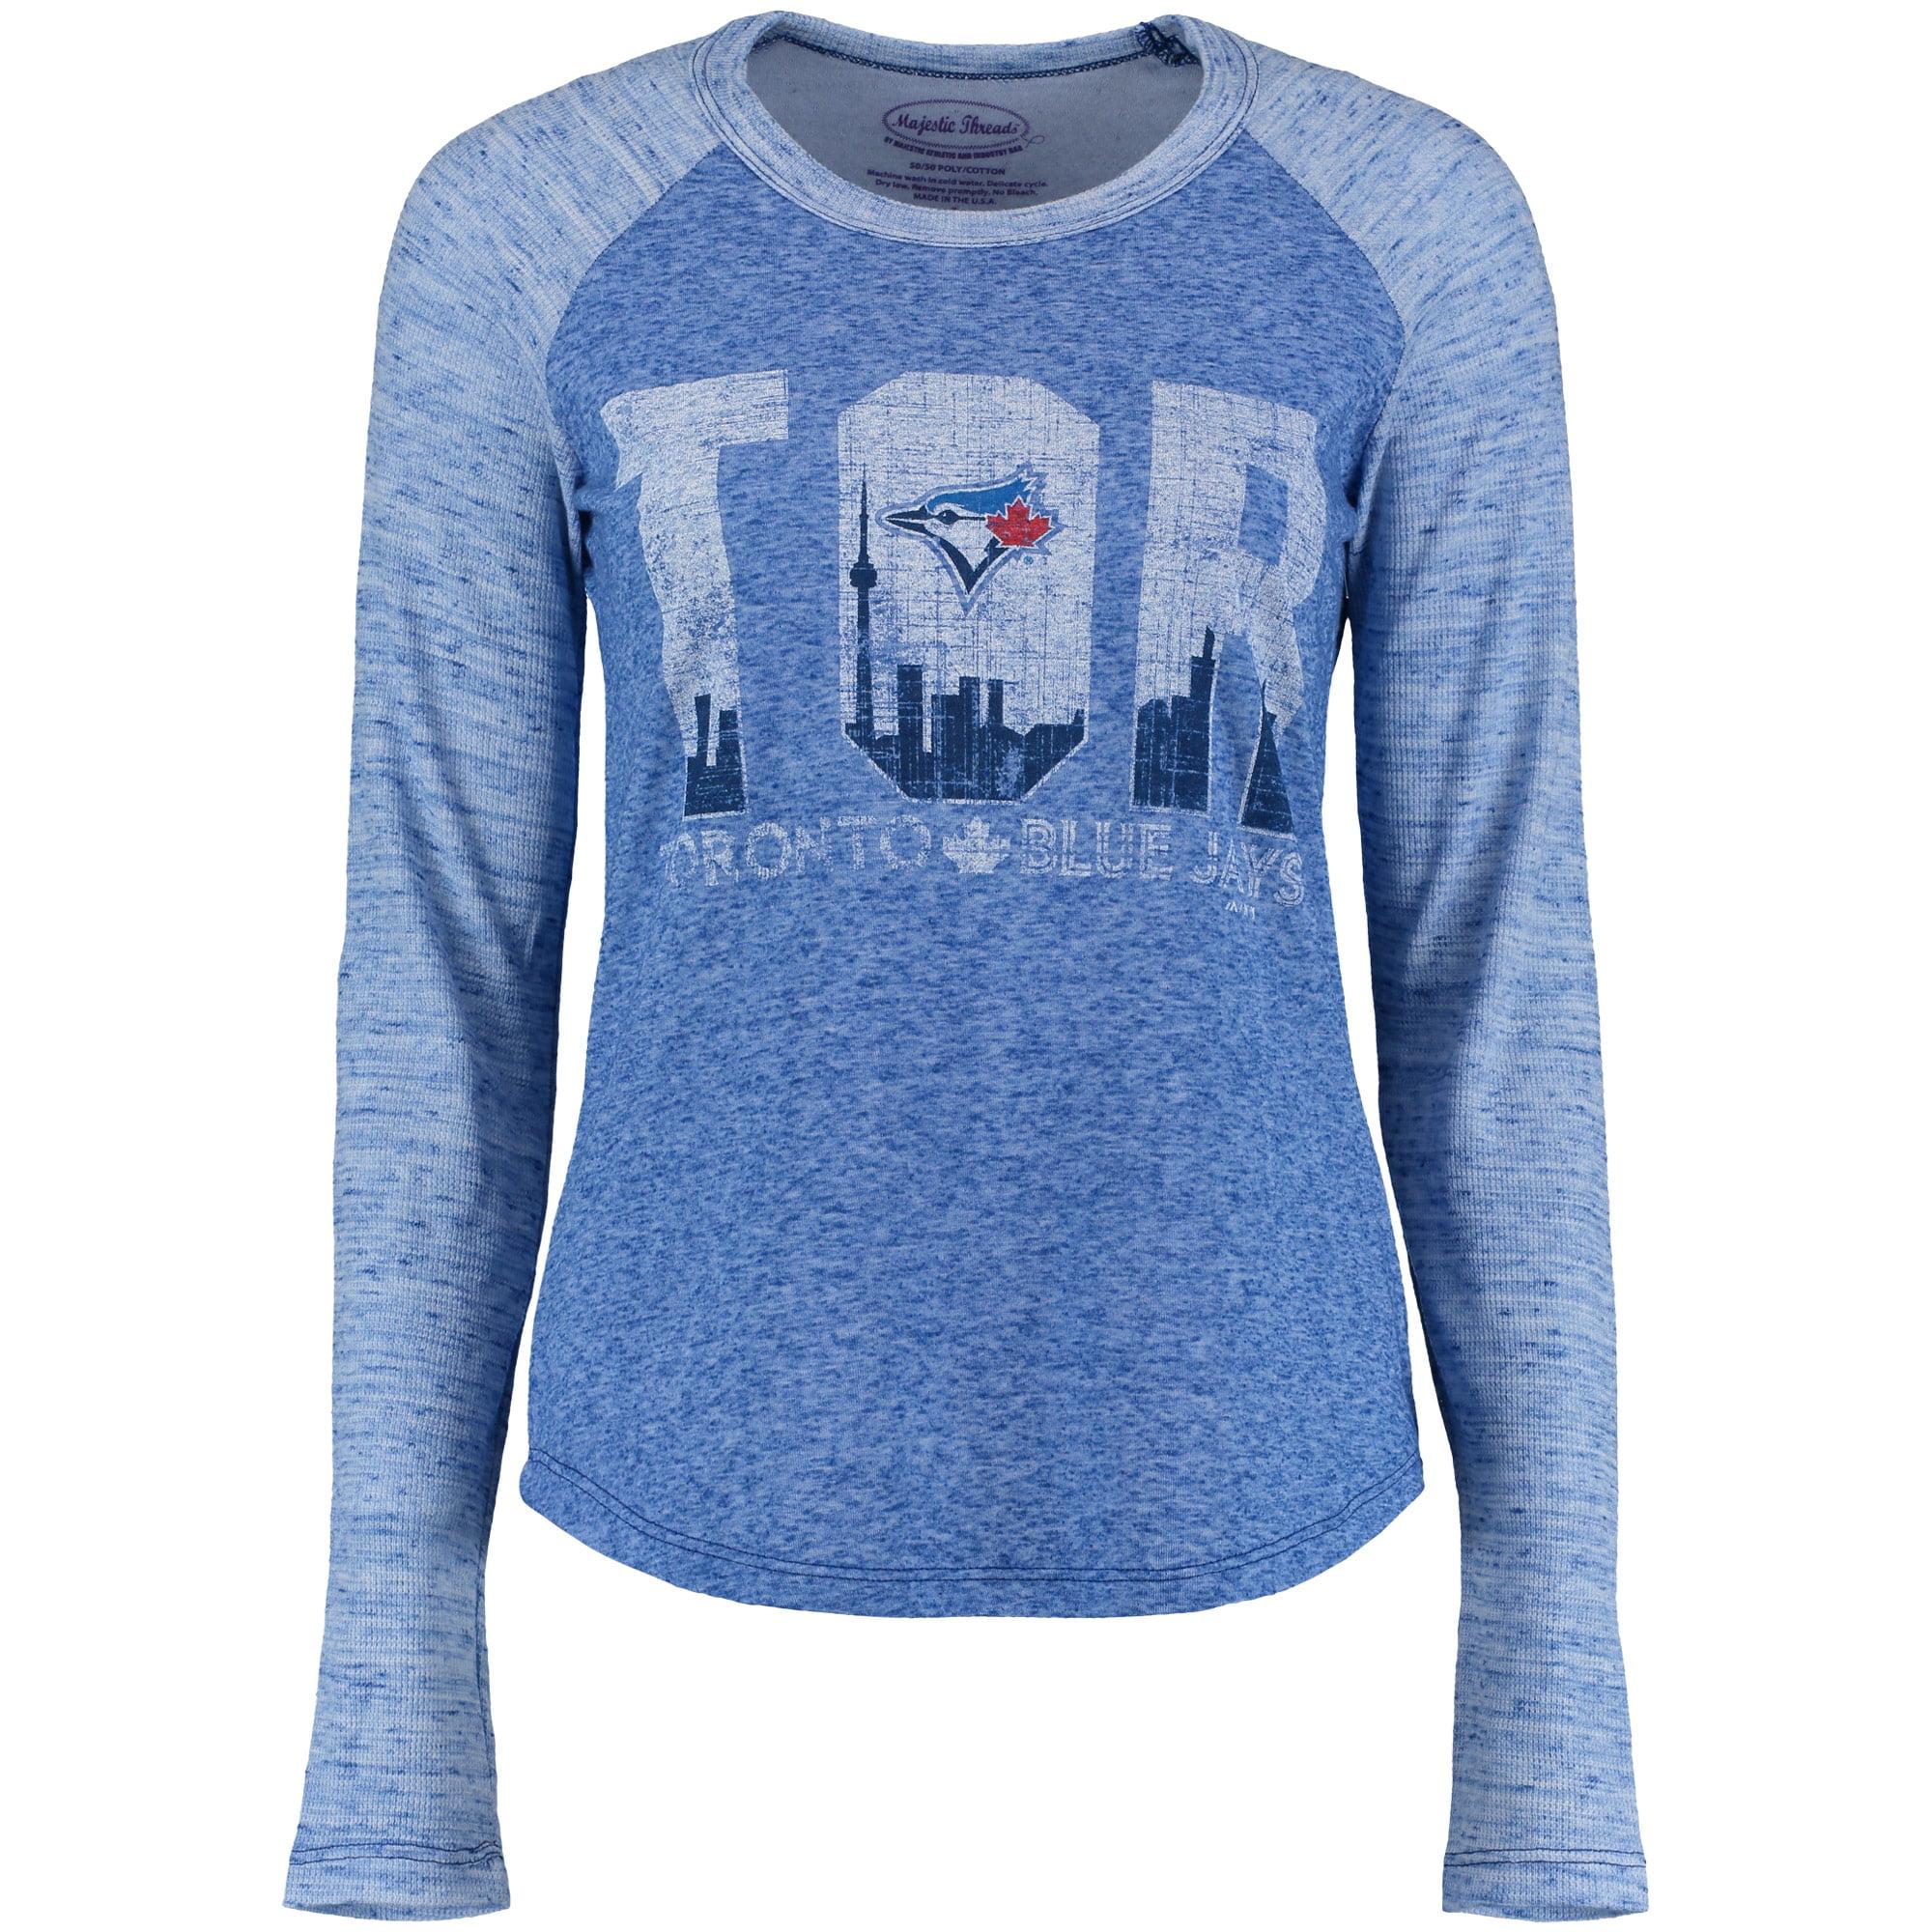 Toronto Blue Jays Majestic Threads Women's Random Phrase Three-Quarter Sleeve T-Shirt - Heathered Royal